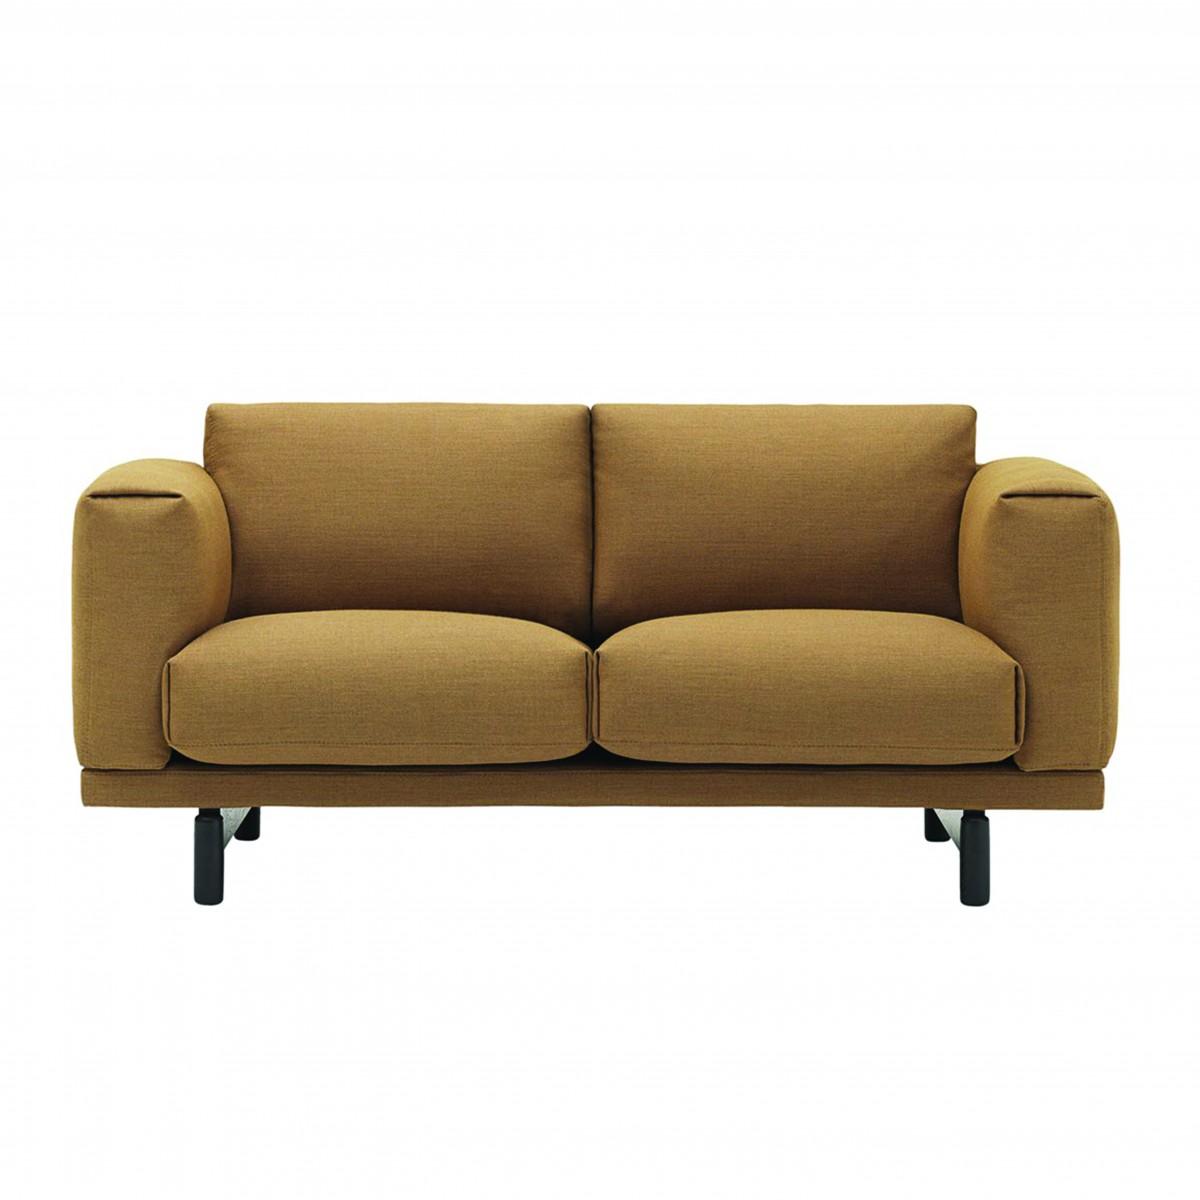 rest studio sofa fiord 451 muuto. Black Bedroom Furniture Sets. Home Design Ideas